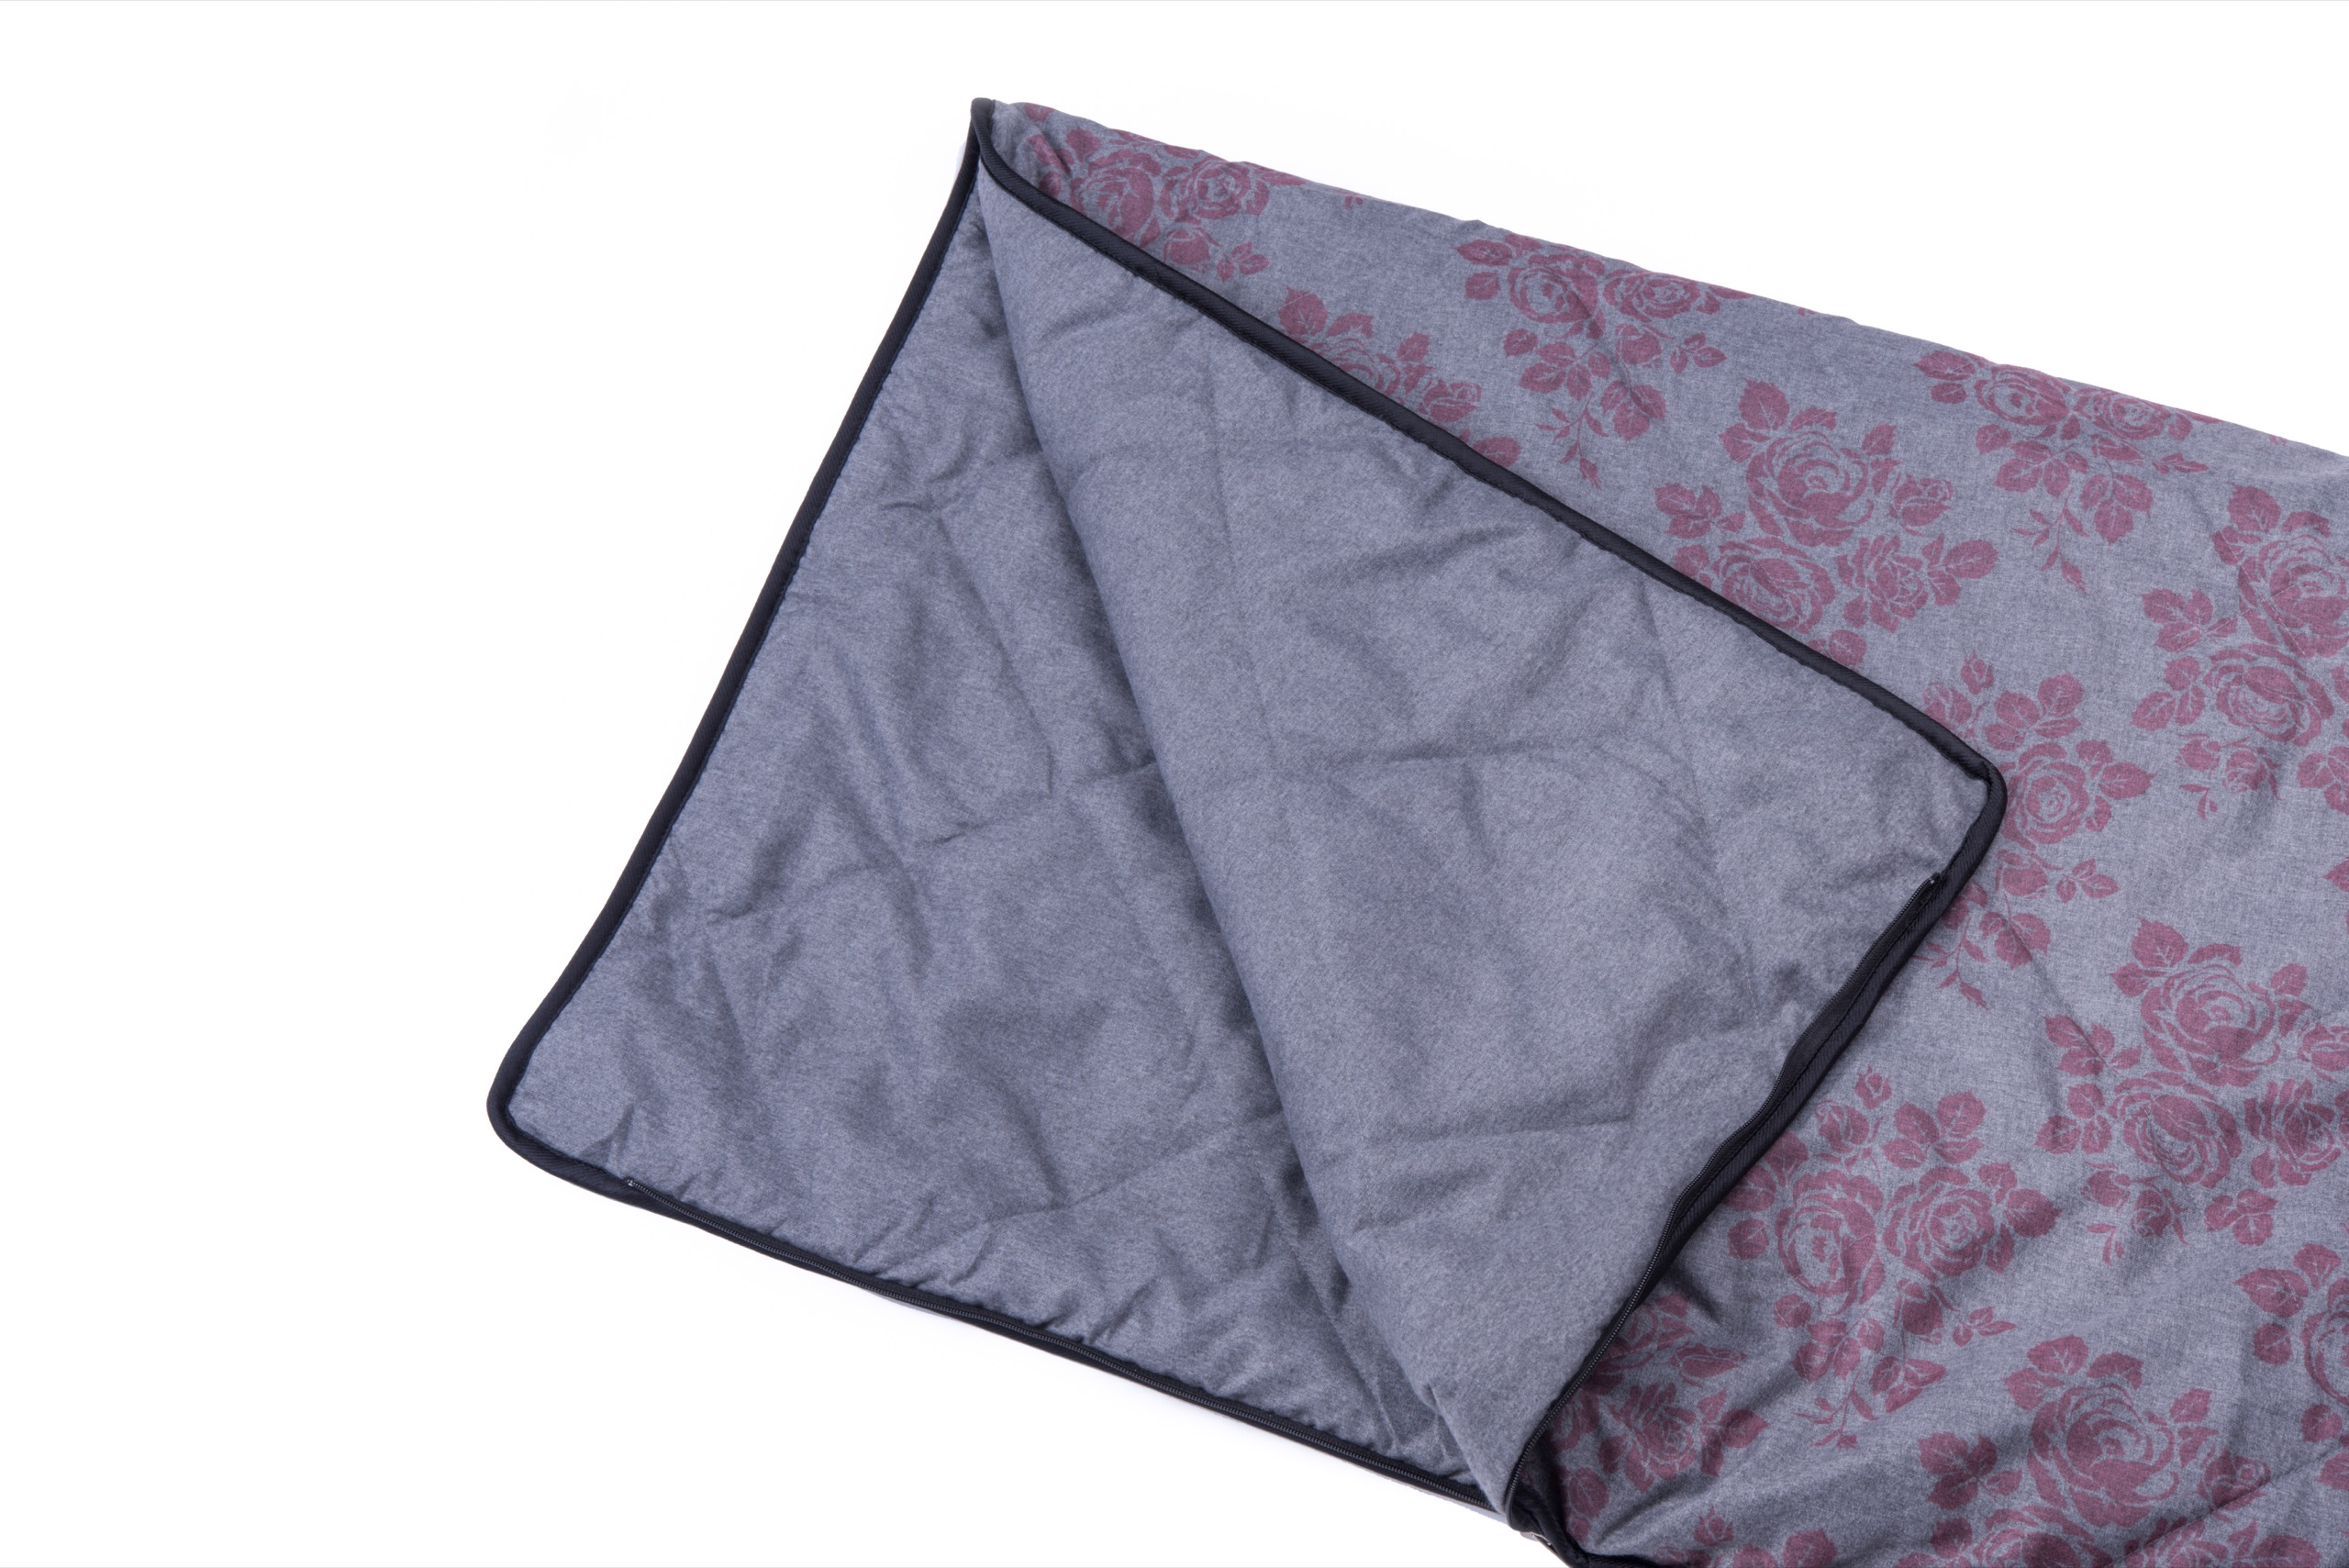 WellhealthBlanket Wool Deluxe